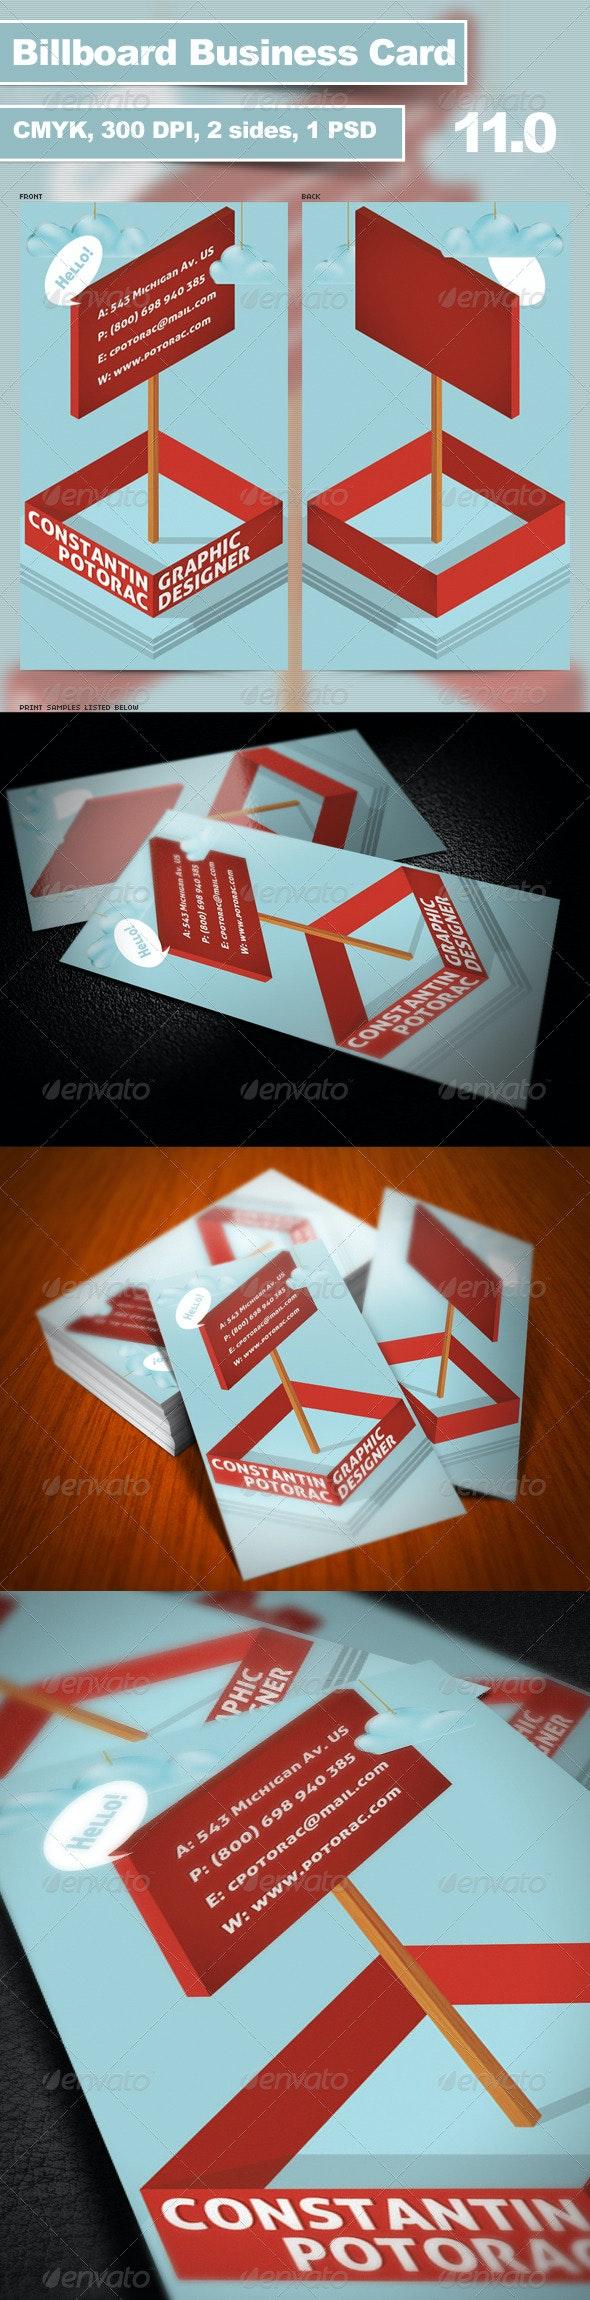 Billboard Business Card 11.0 - Creative Business Cards